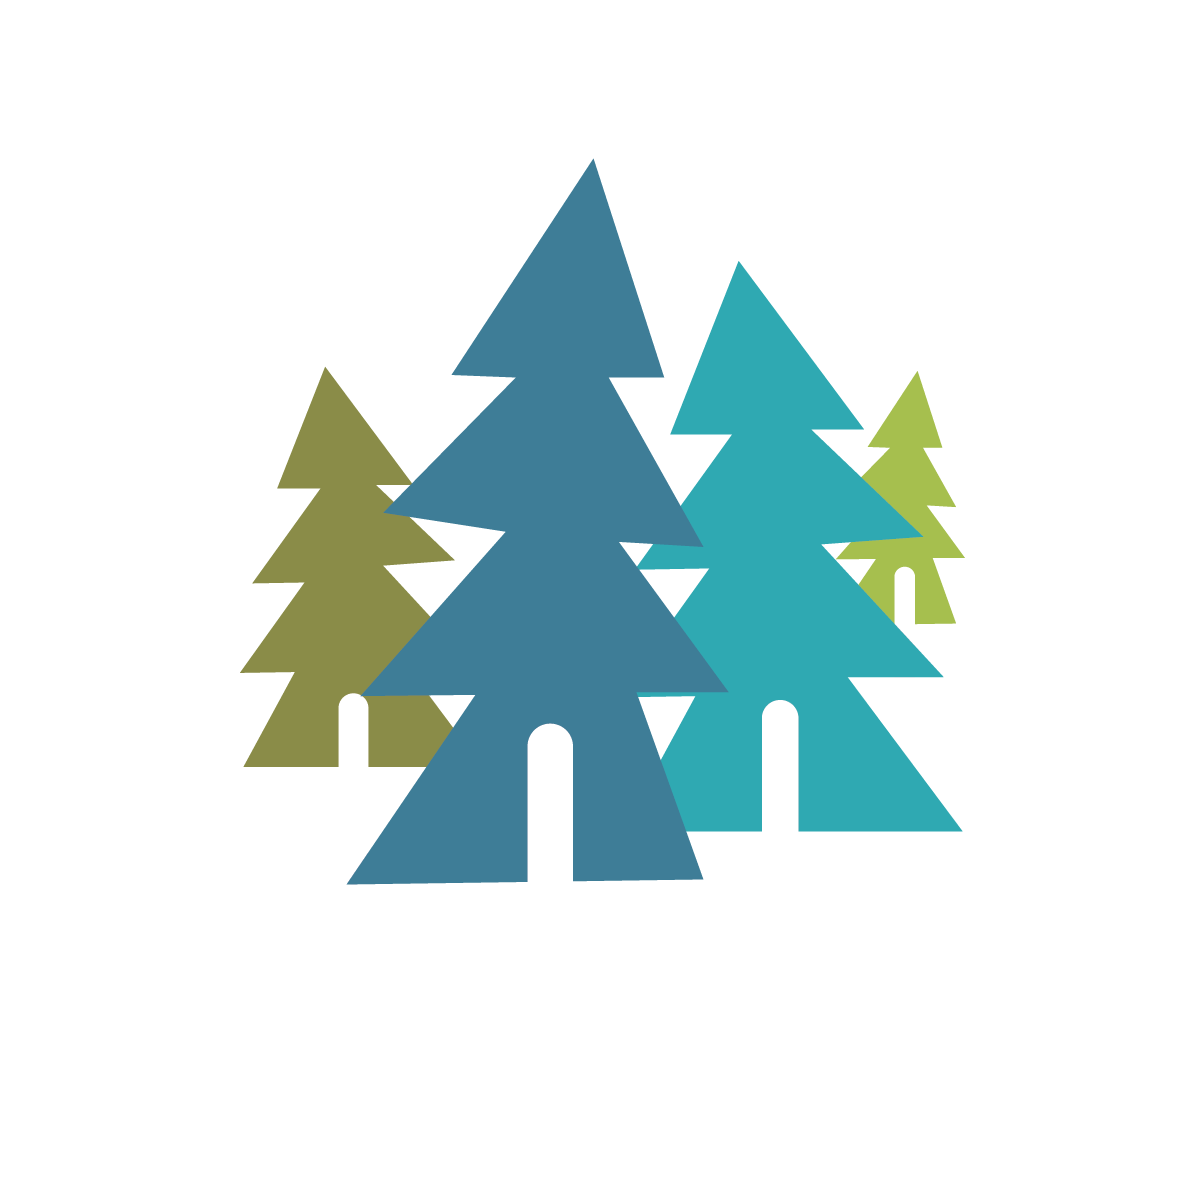 cc-logo_10.png